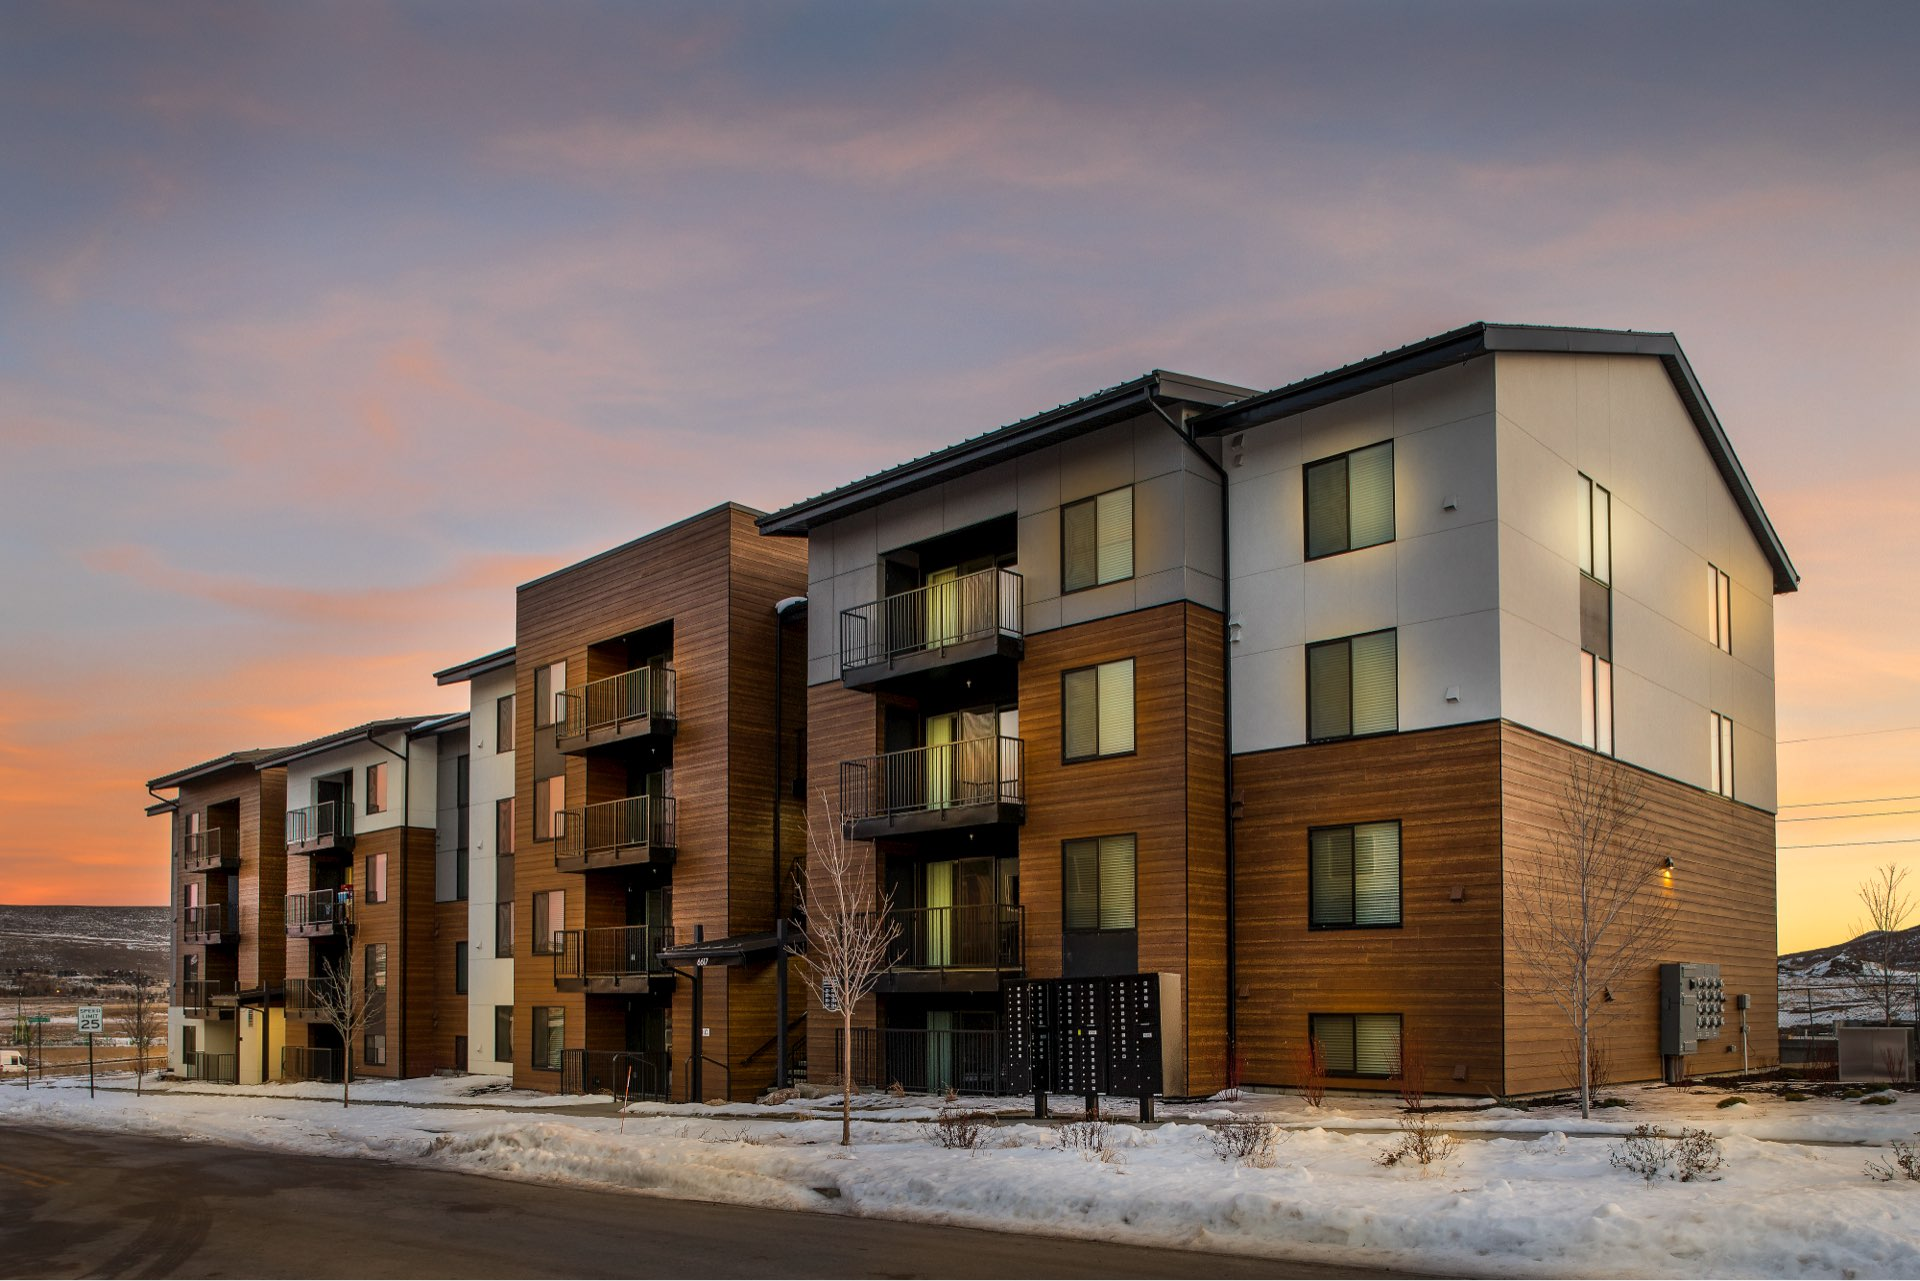 Central Village Condominiums, architectural design by Elliott Workgroup